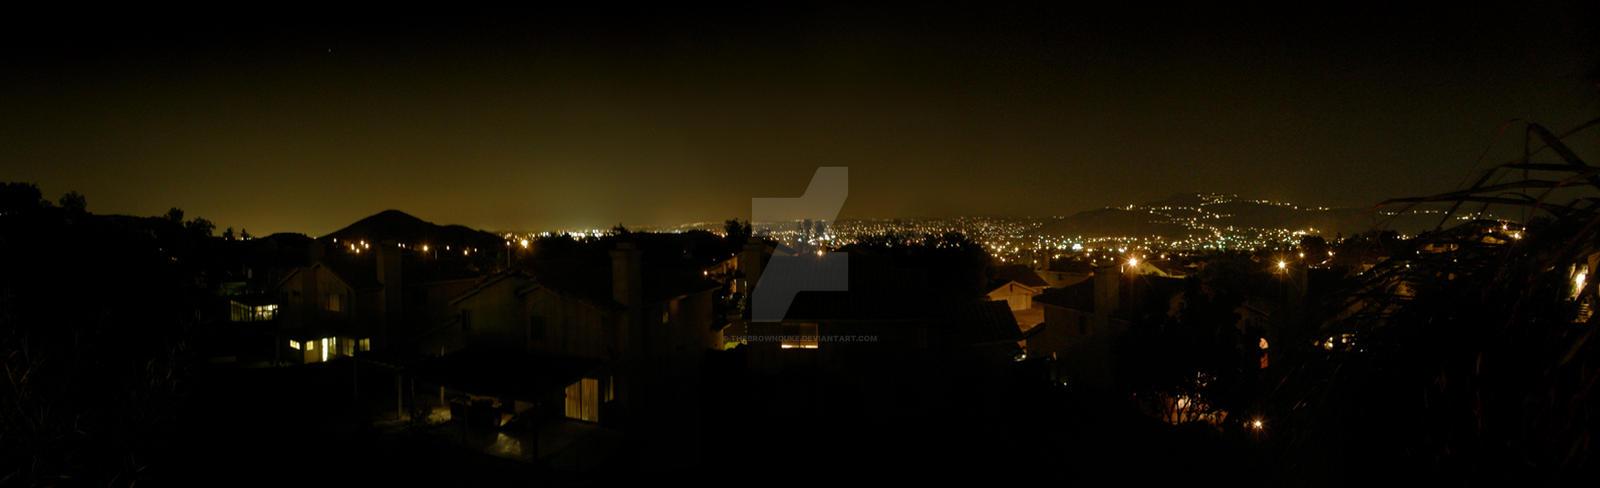 Corona Hills at Night